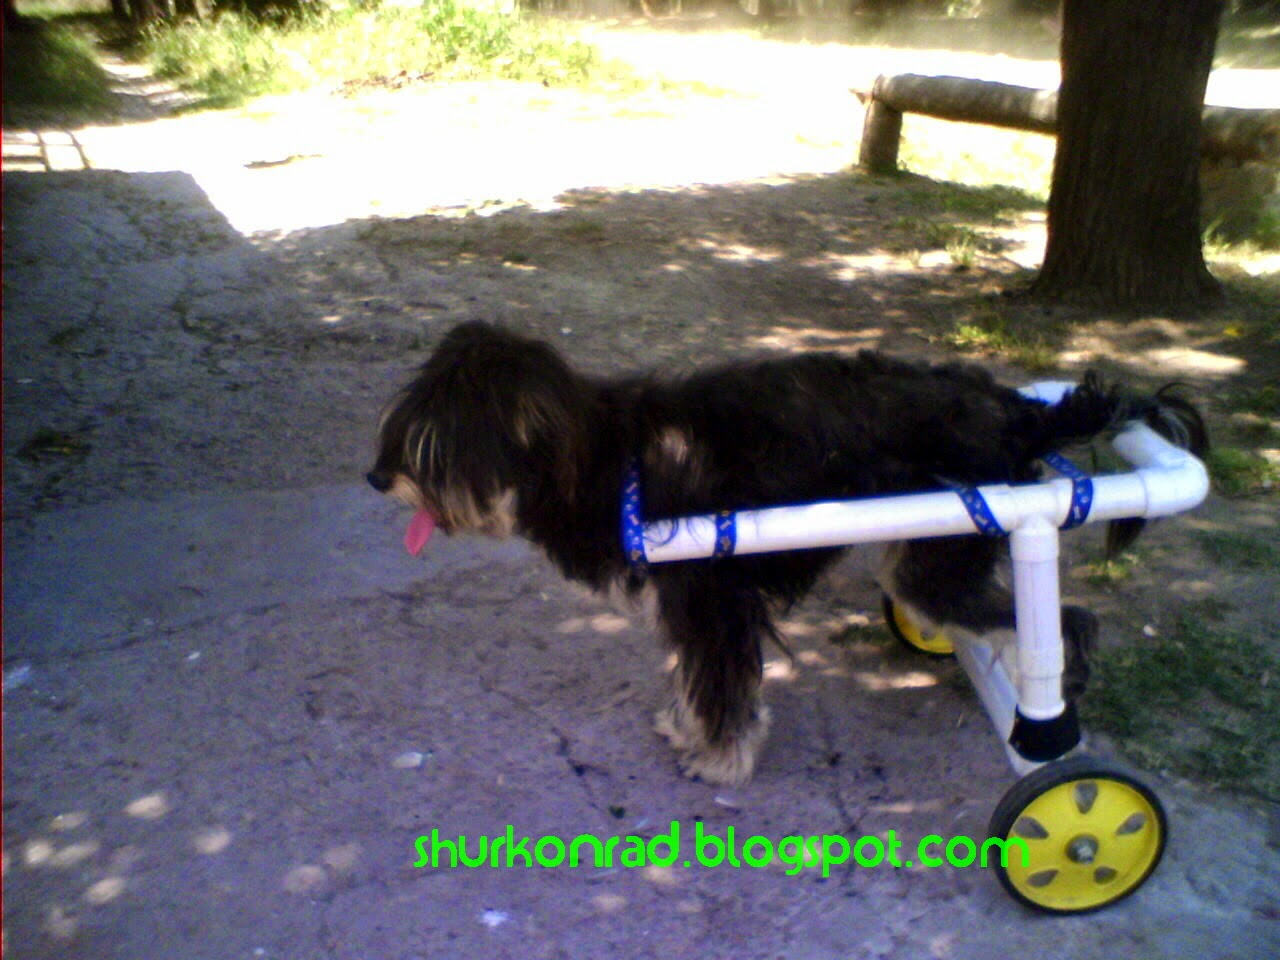 ShurKonrad perro silla ruedas dog 32